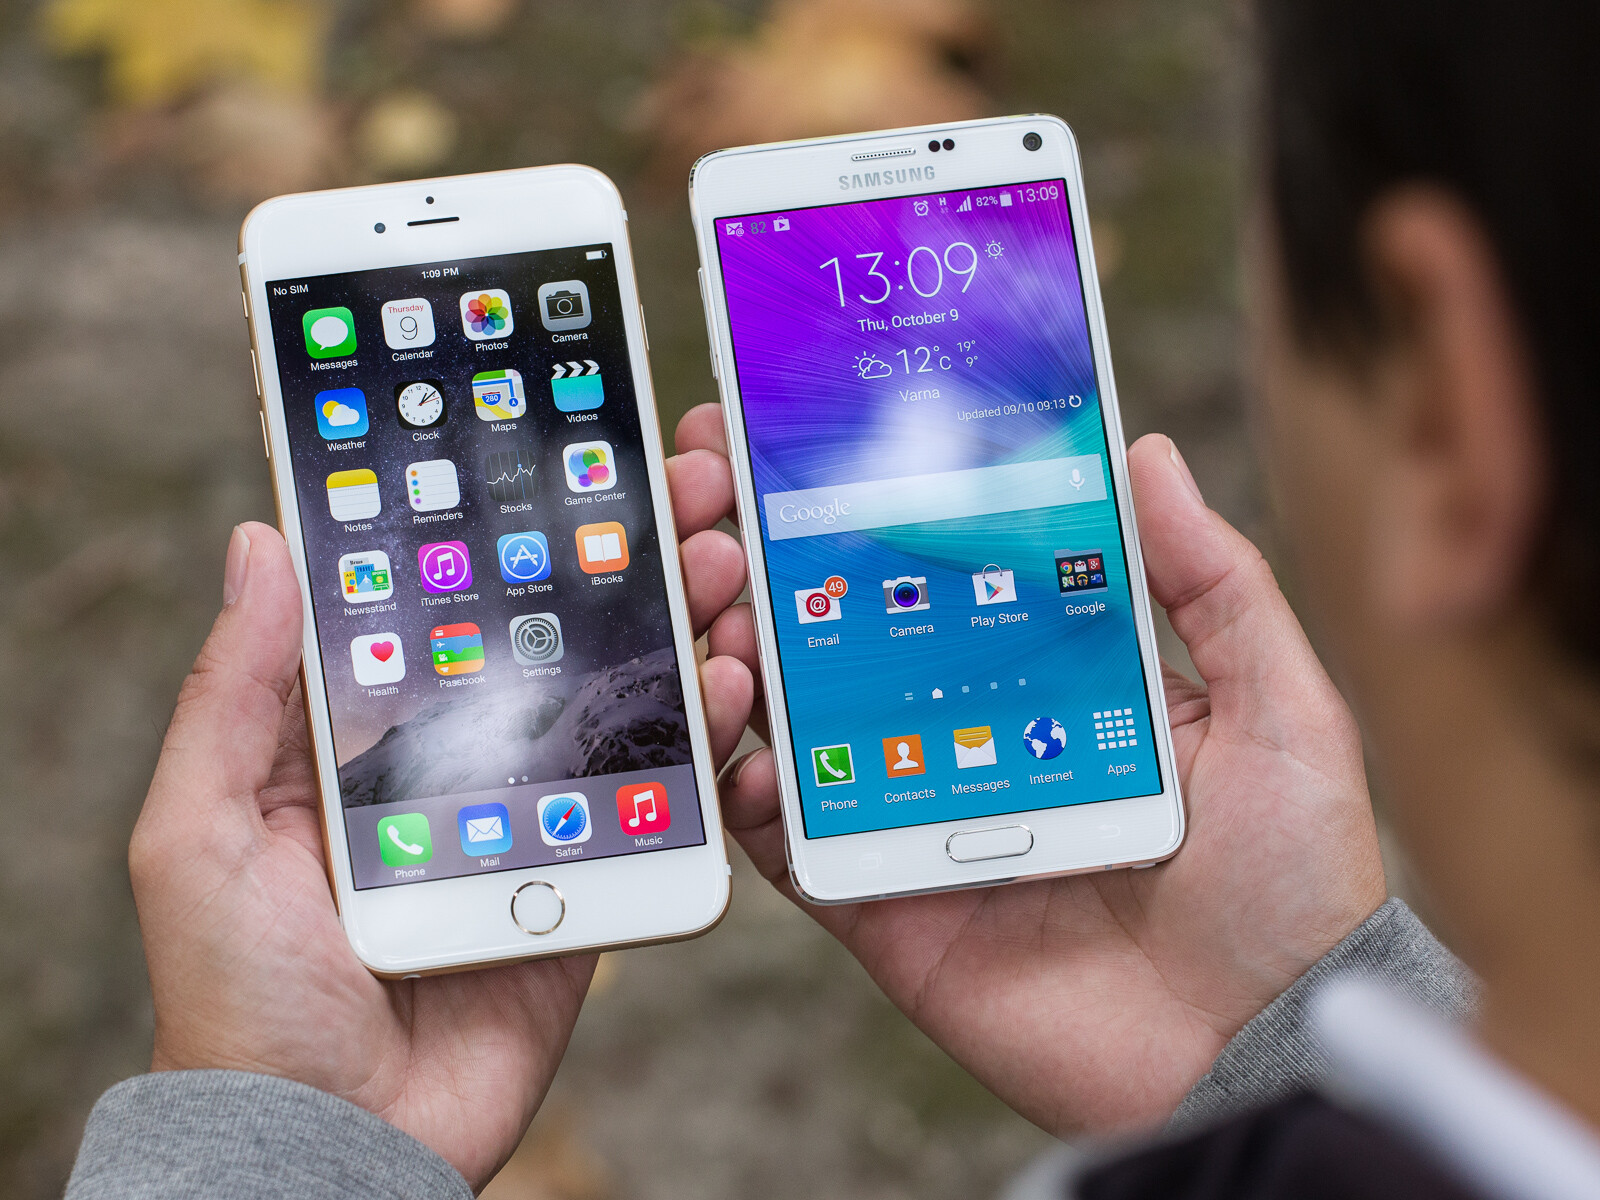 SAMSUNG GALAXY NOTE 4 VS IPHONE 6